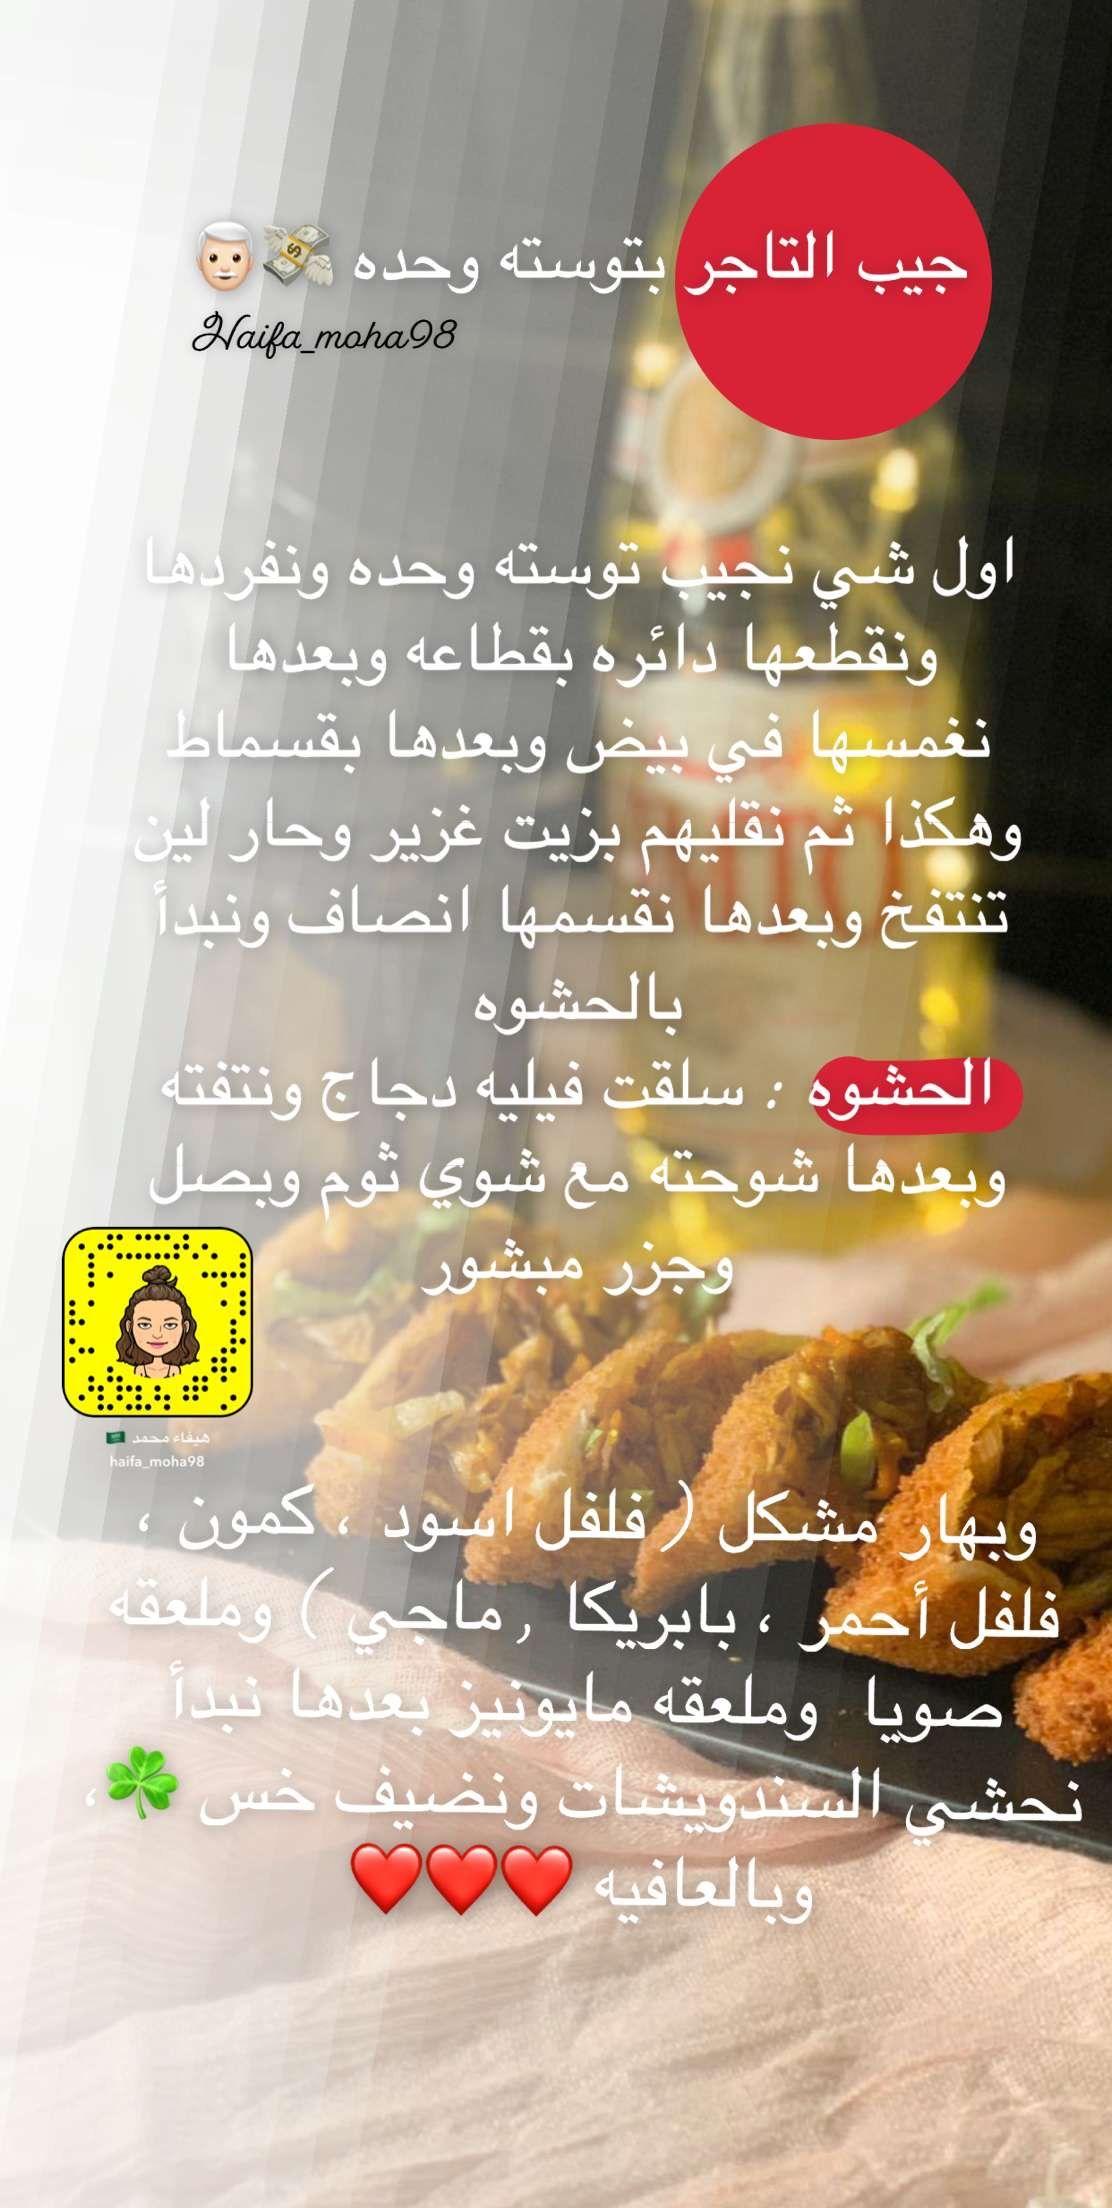 جيب التاجر جيب التاجر طبخات رمضانيه رمضان Diy Food Recipes Cookout Food Food Receipes